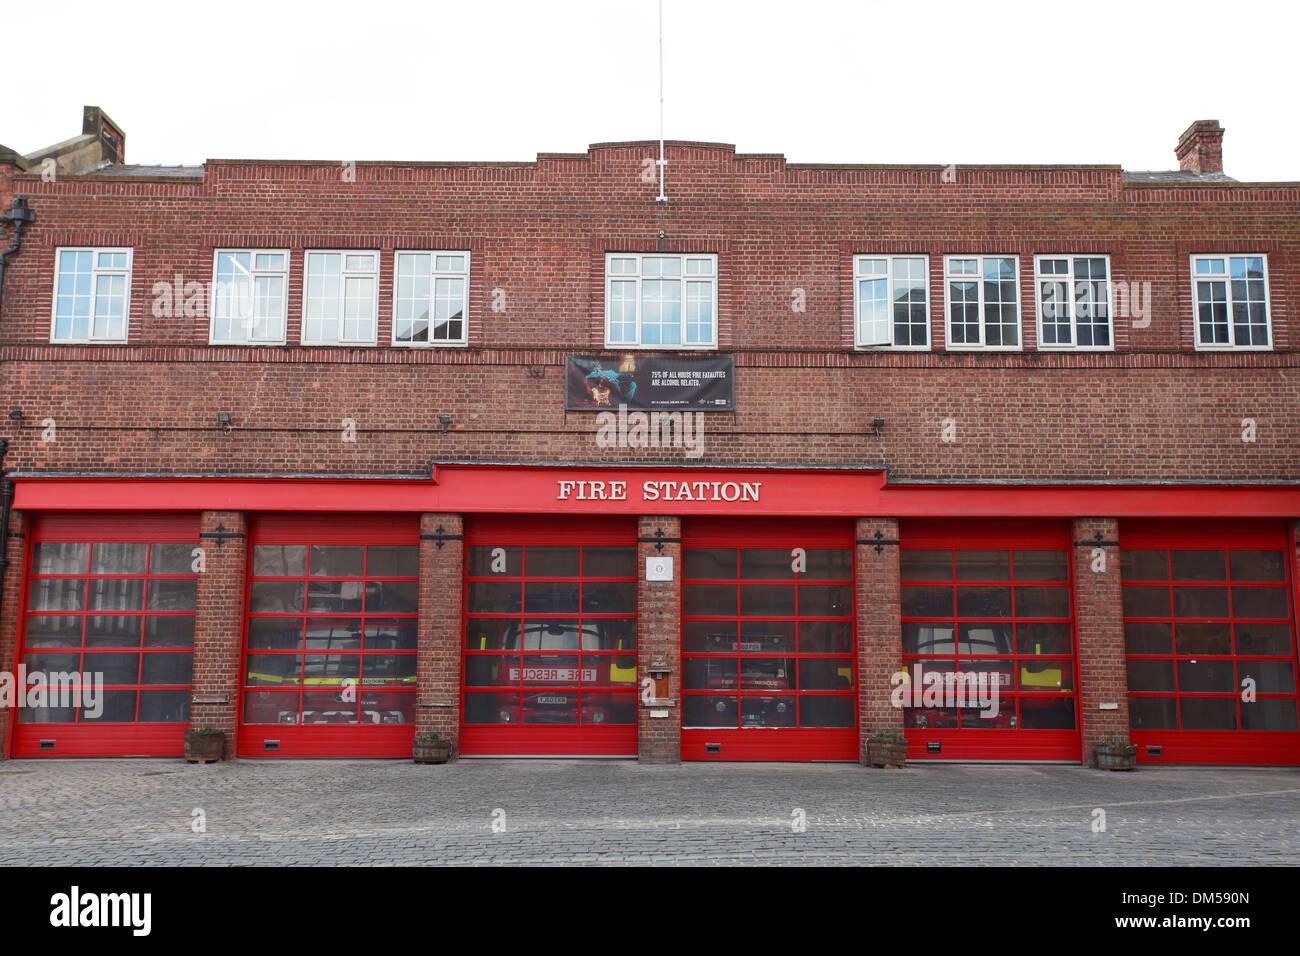 York Fire Station, Yorkshire - Stock Image